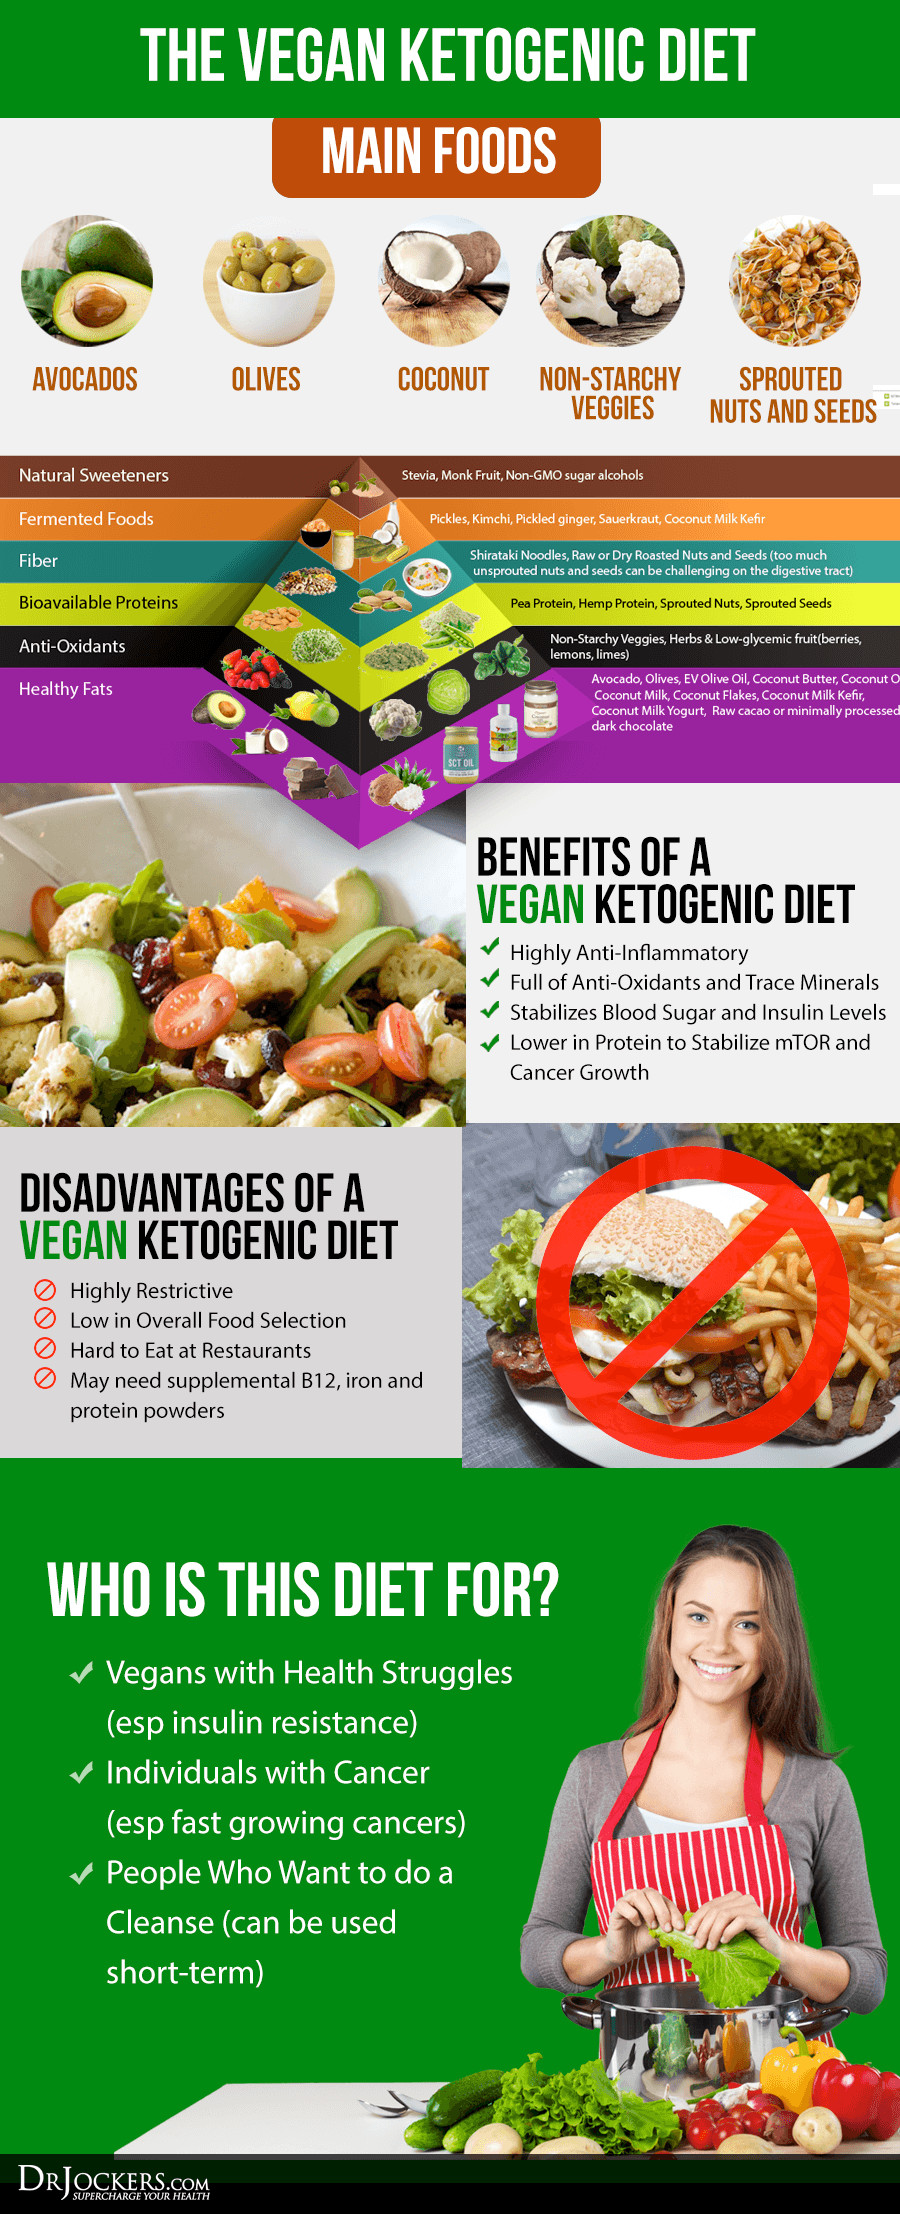 Keto Vegan Diet Plan  How To Follow A Vegan Ketogenic Diet DrJockers